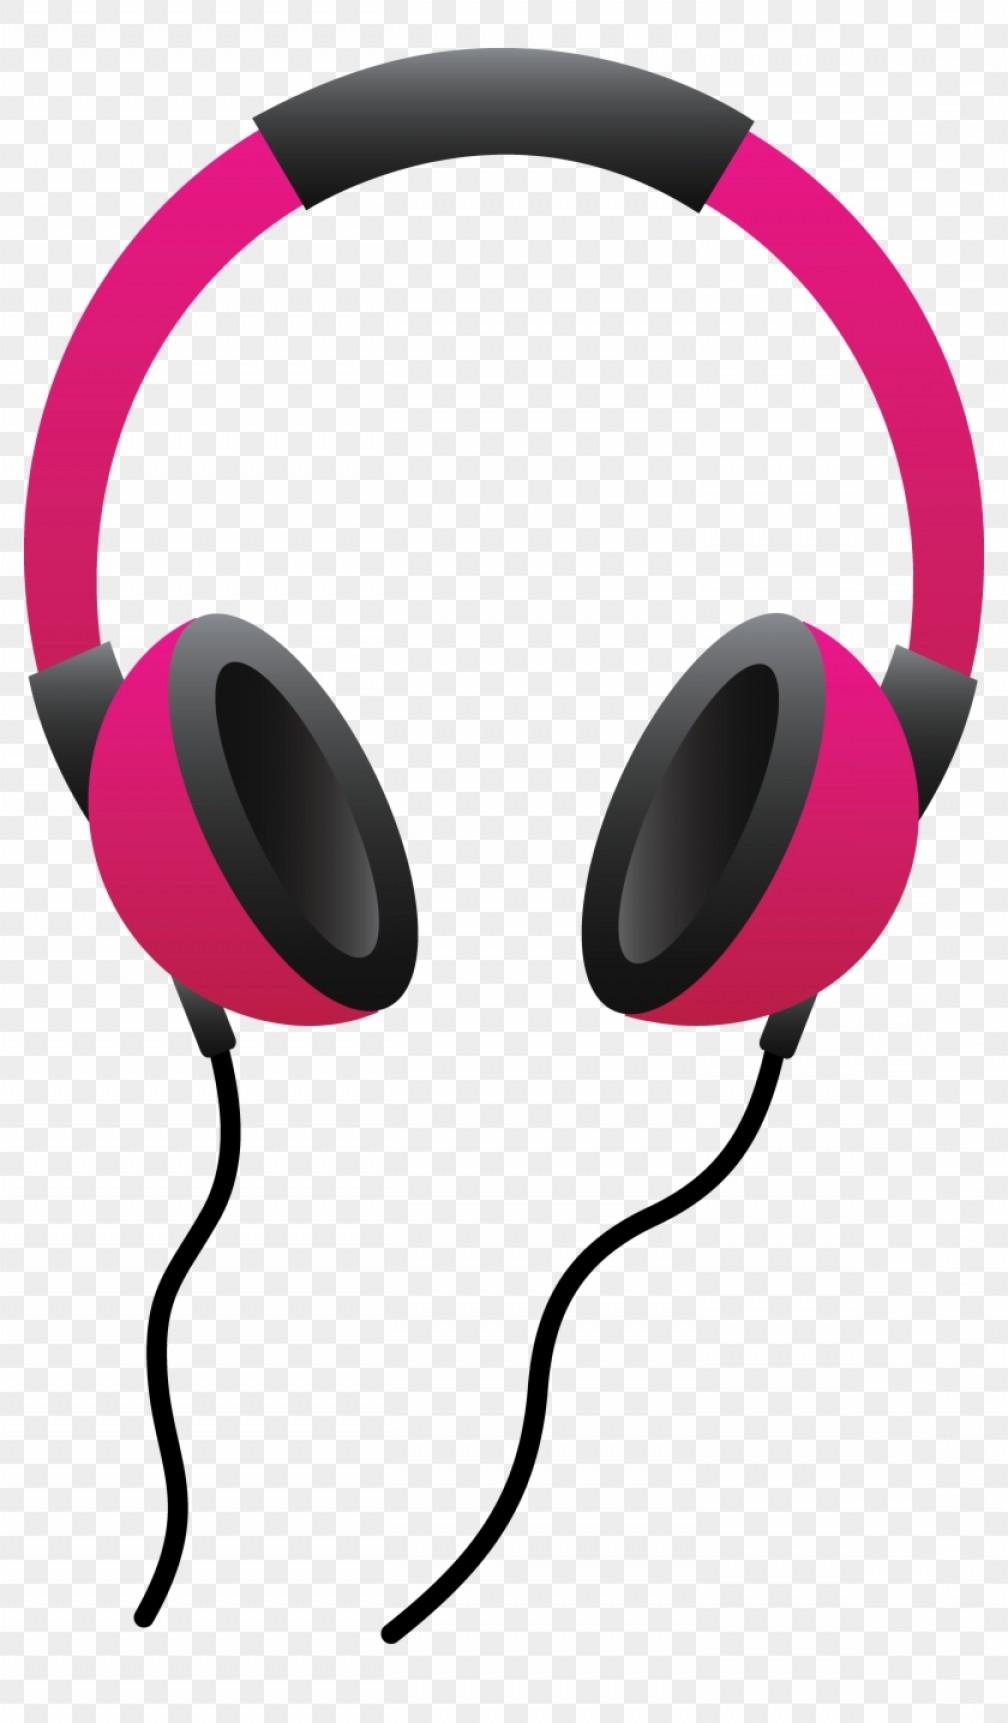 Miizikiaipod Clip Art Pink Headphones Clipart.